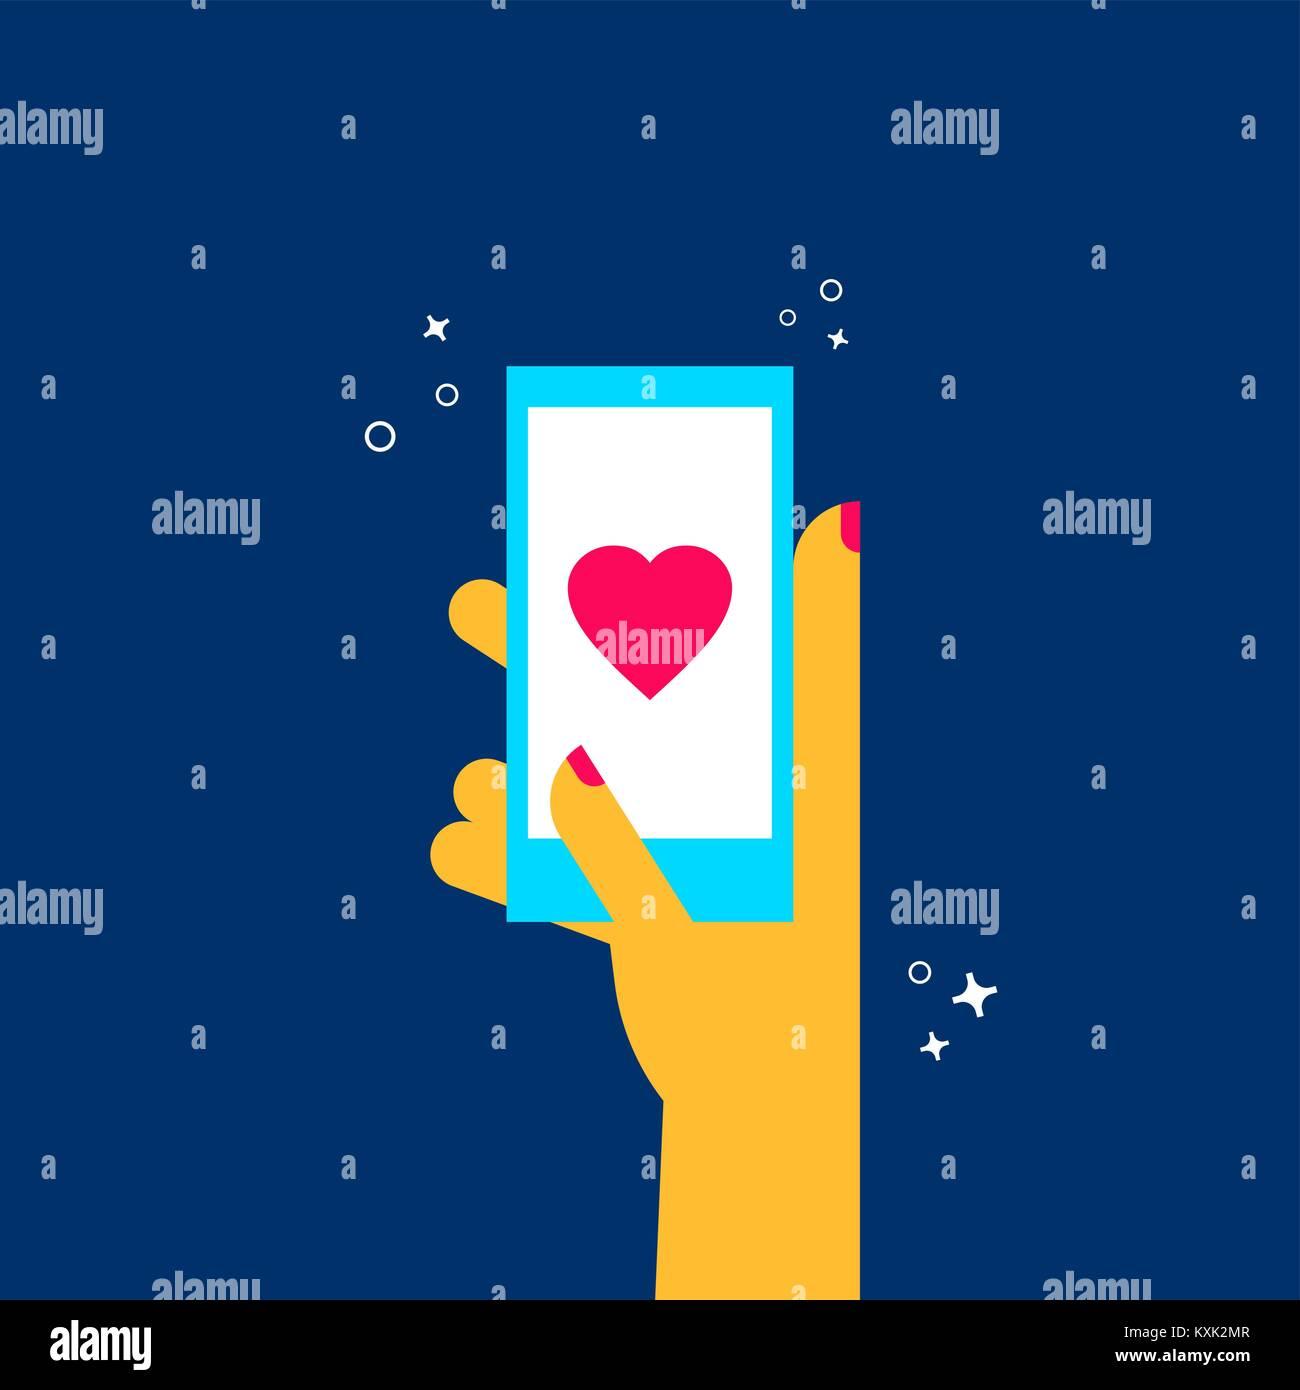 Telefon online dating app